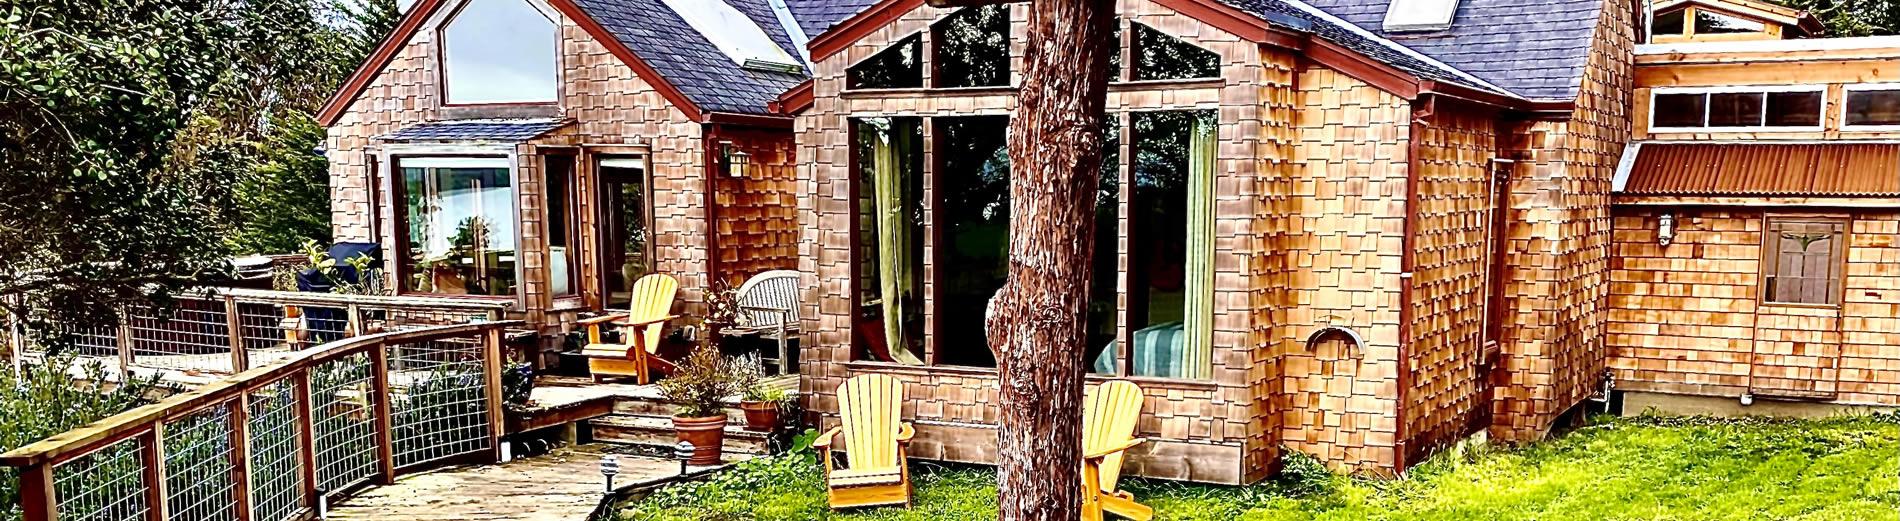 farmhouse vacation rental in marshall ca, point reyes national seashore